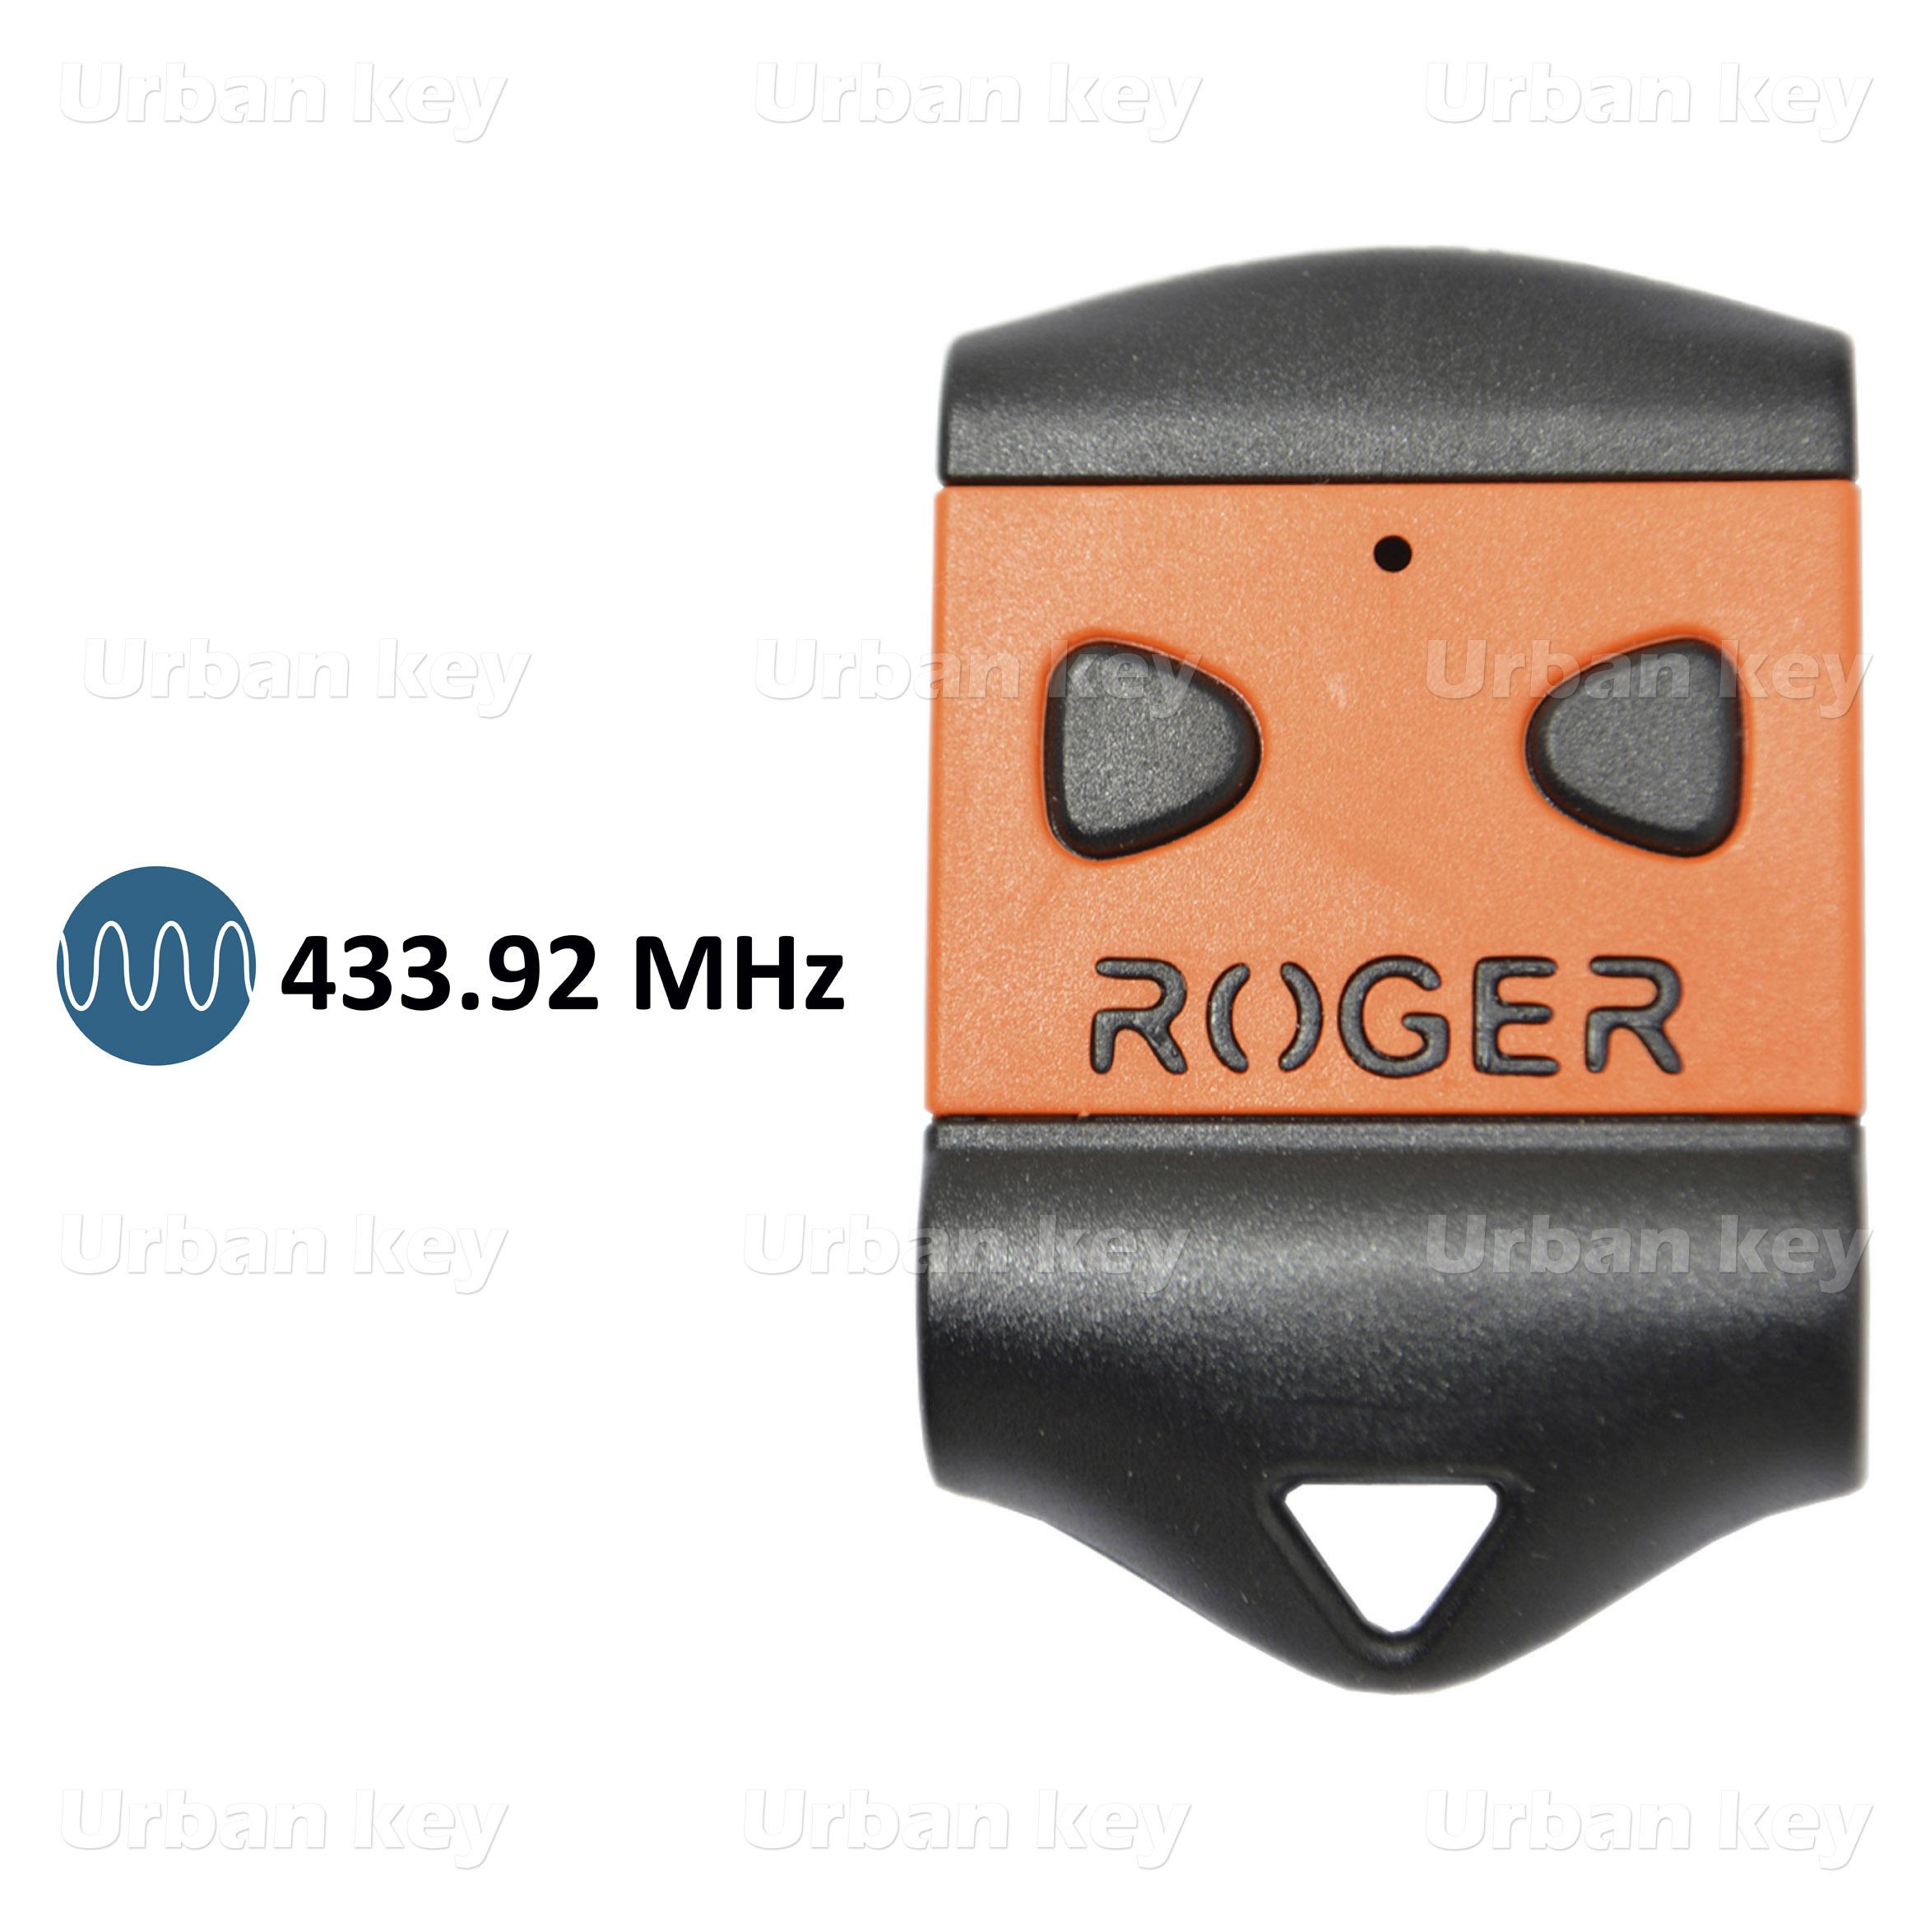 EMISSOR ROGER H80-TX22 433Mhz 2 CANAIS